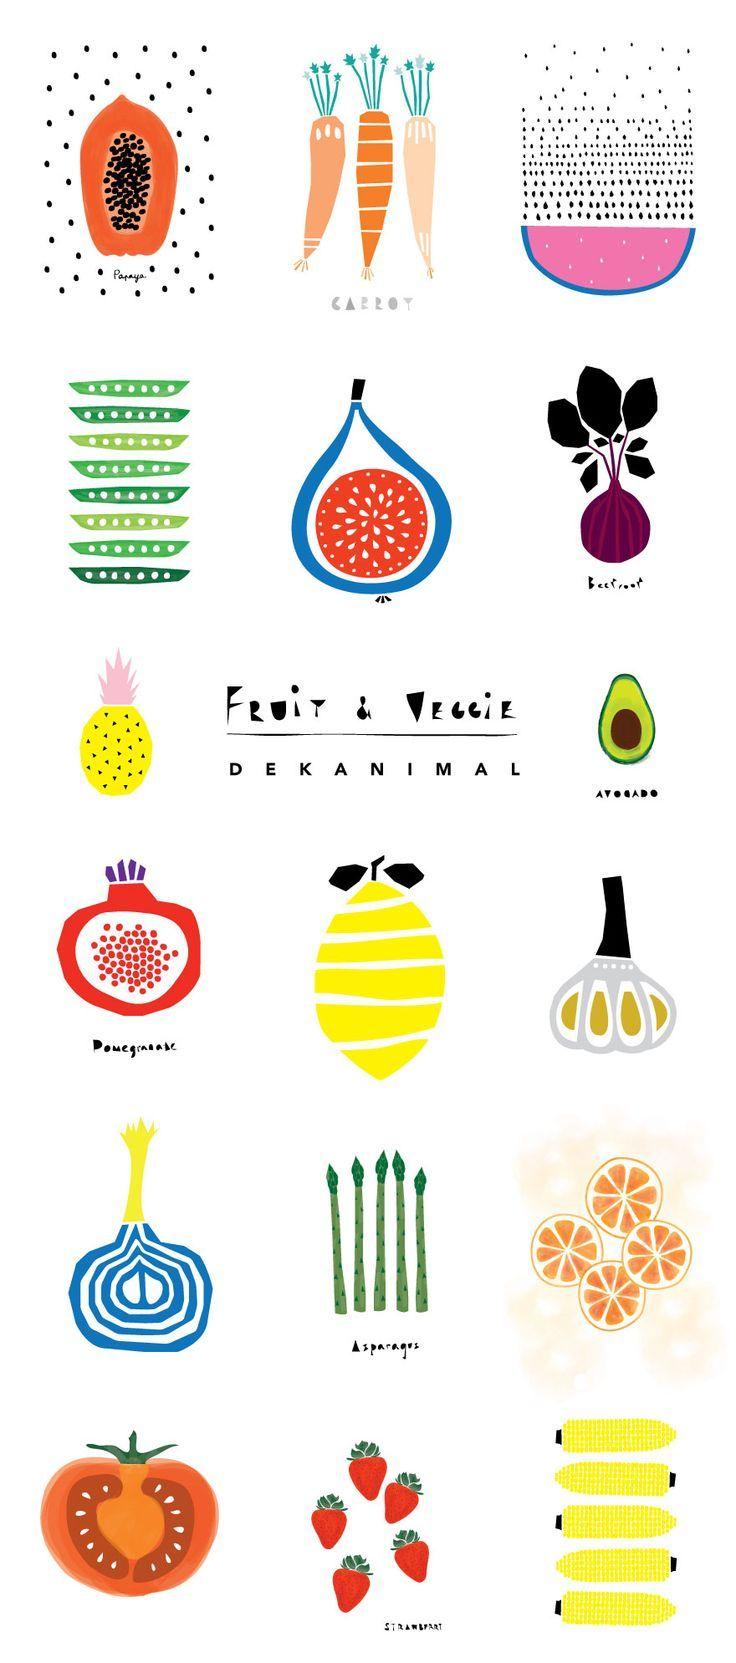 Dekanimal Art illustration kid's room decor Fruits and Veggies print Home decor Nursery print Kitchen art